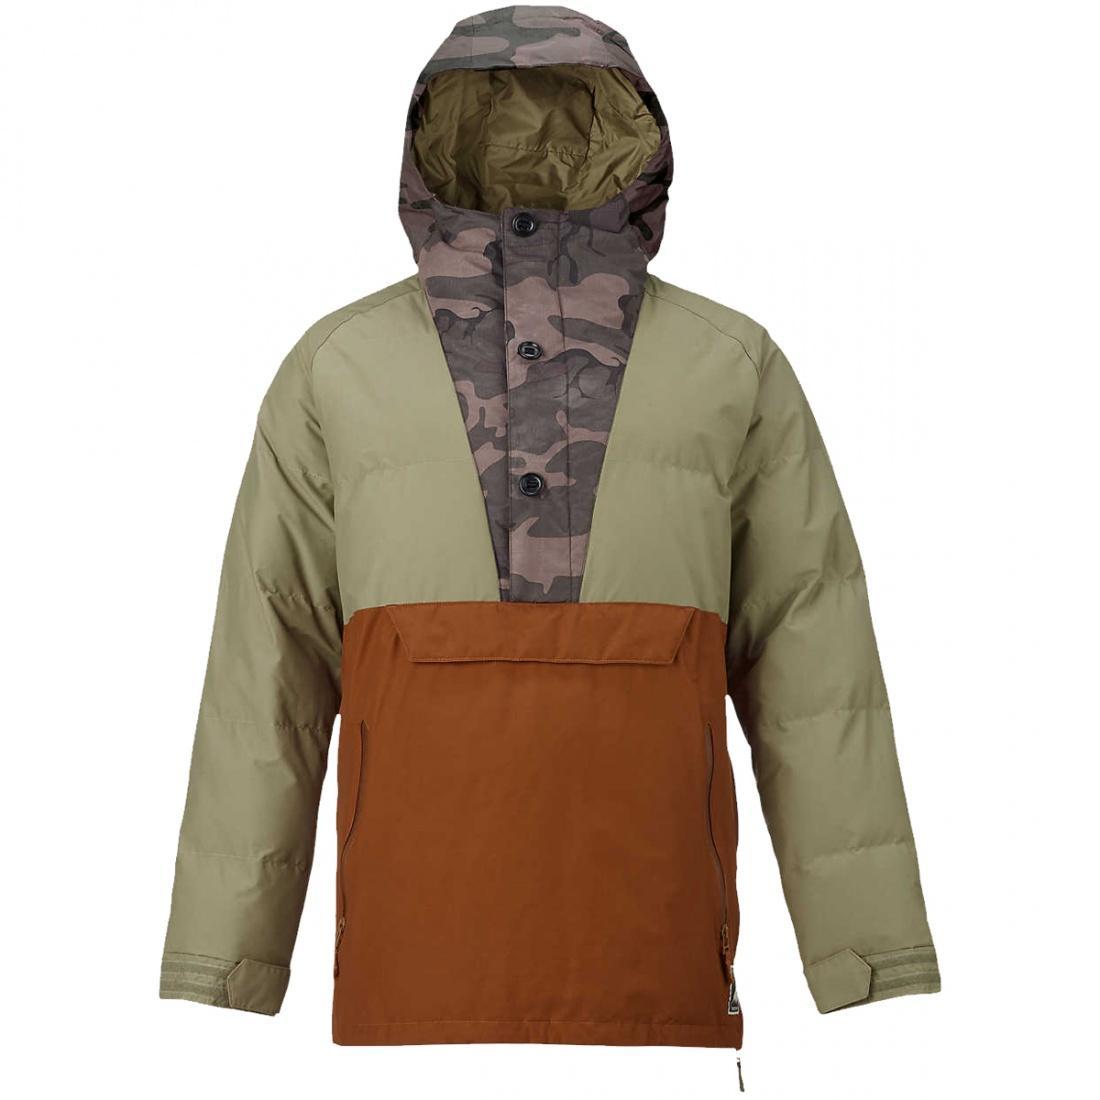 Burton Куртка MB SERVICE ANORAK (M, BKAMO/RCKSK/TRU PNNY, , , FW17) burton рюкзак bravo pack gry hthr dimnd rpstp fw17